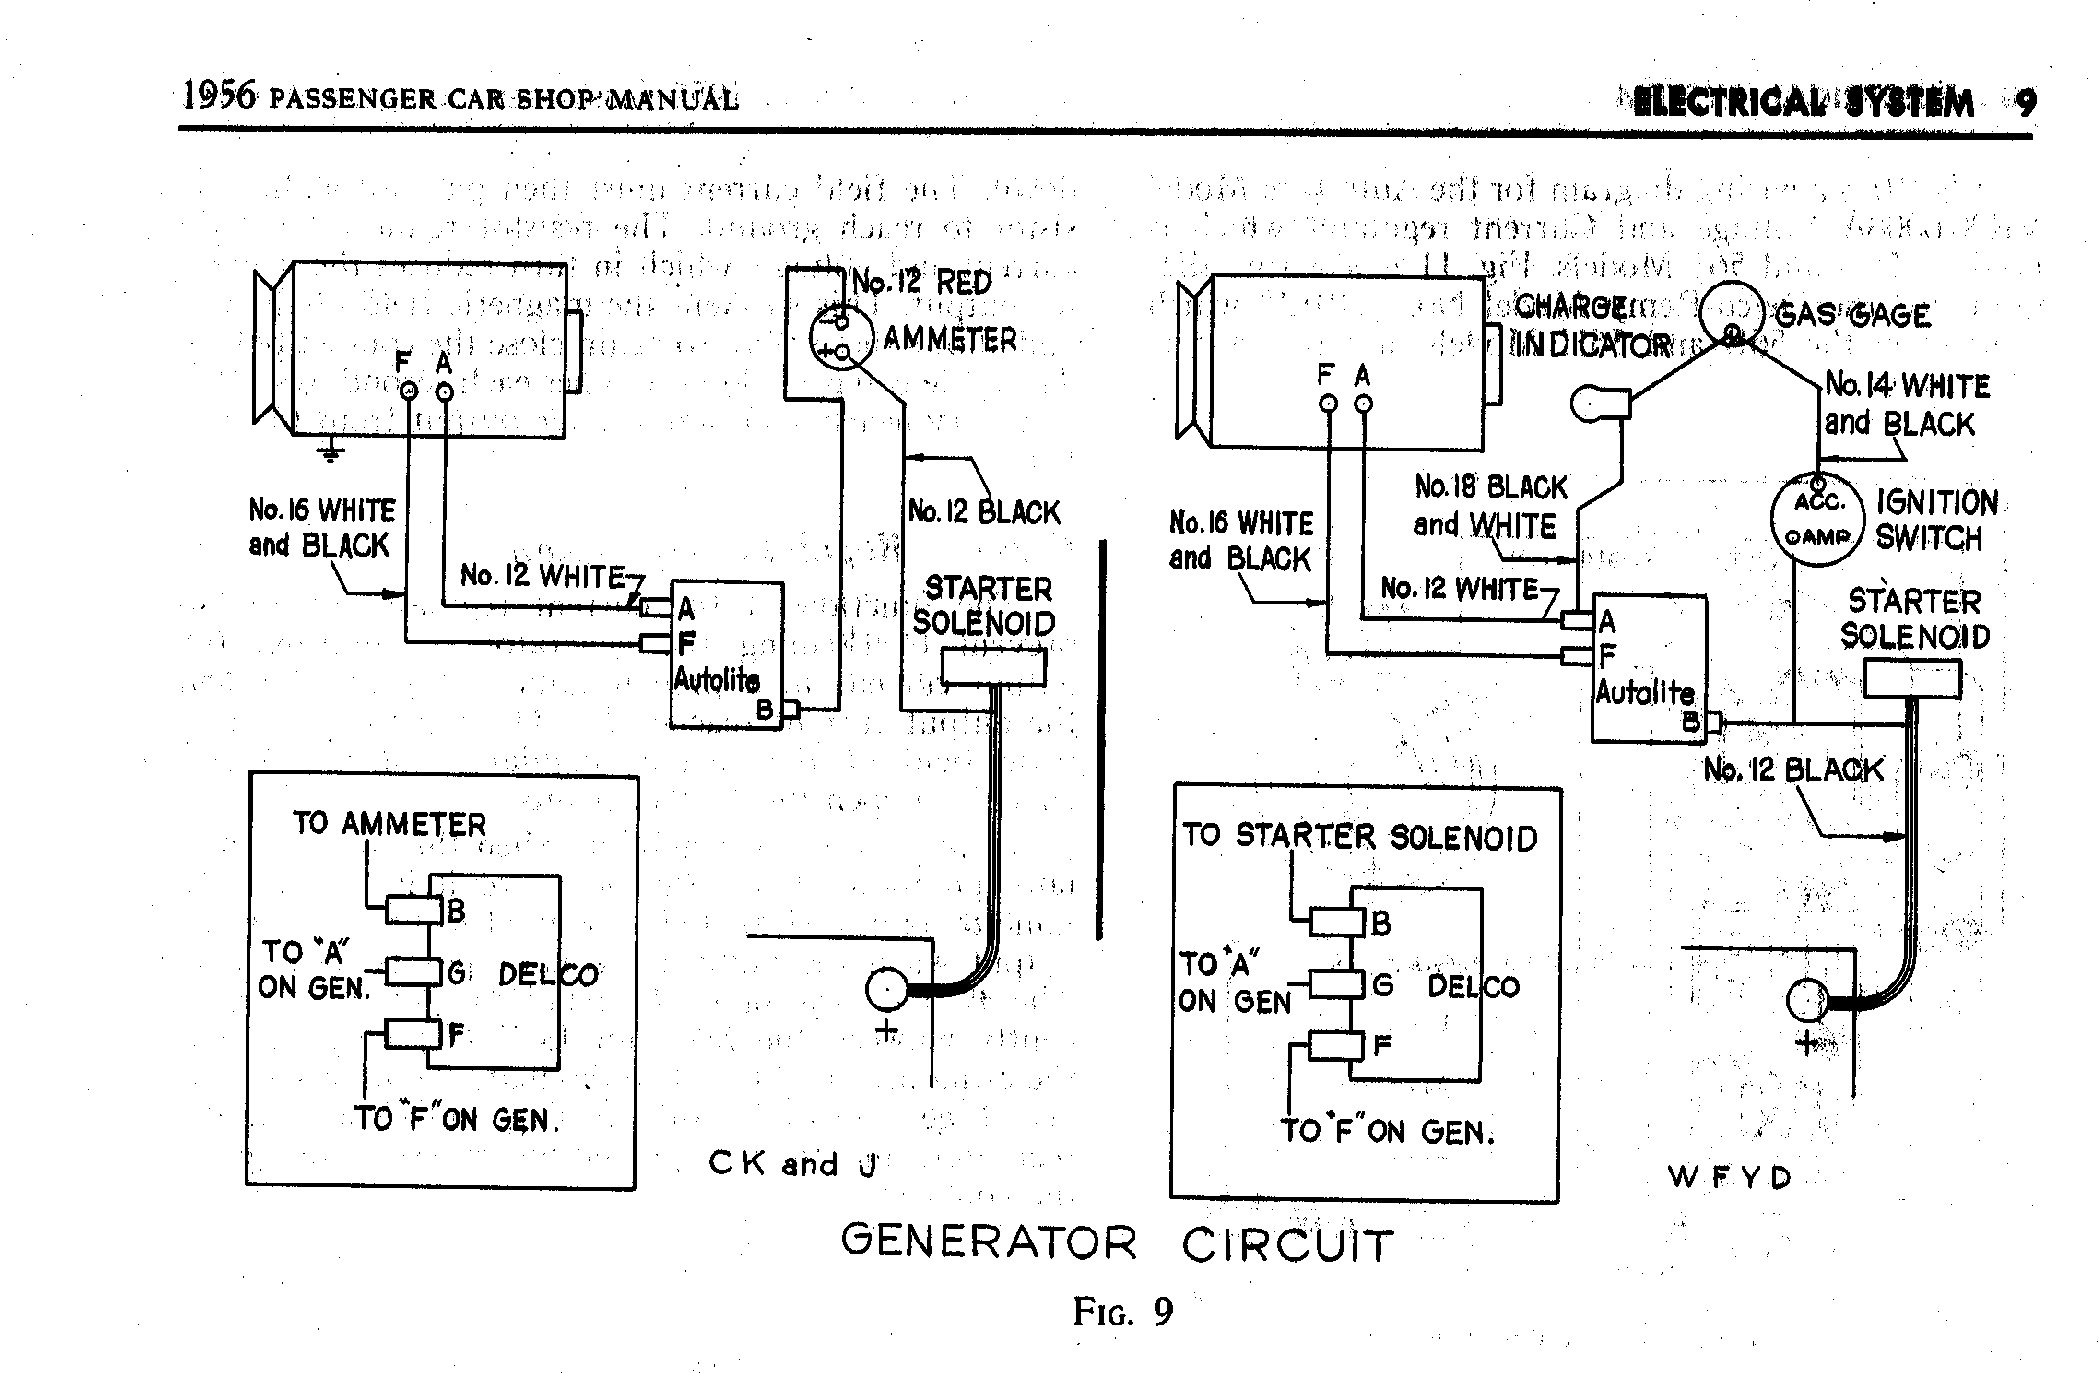 Pdf-7679] Generac Nexus Switch Wiring | 2019 Ebook Library - Generac Generator Wiring Diagram